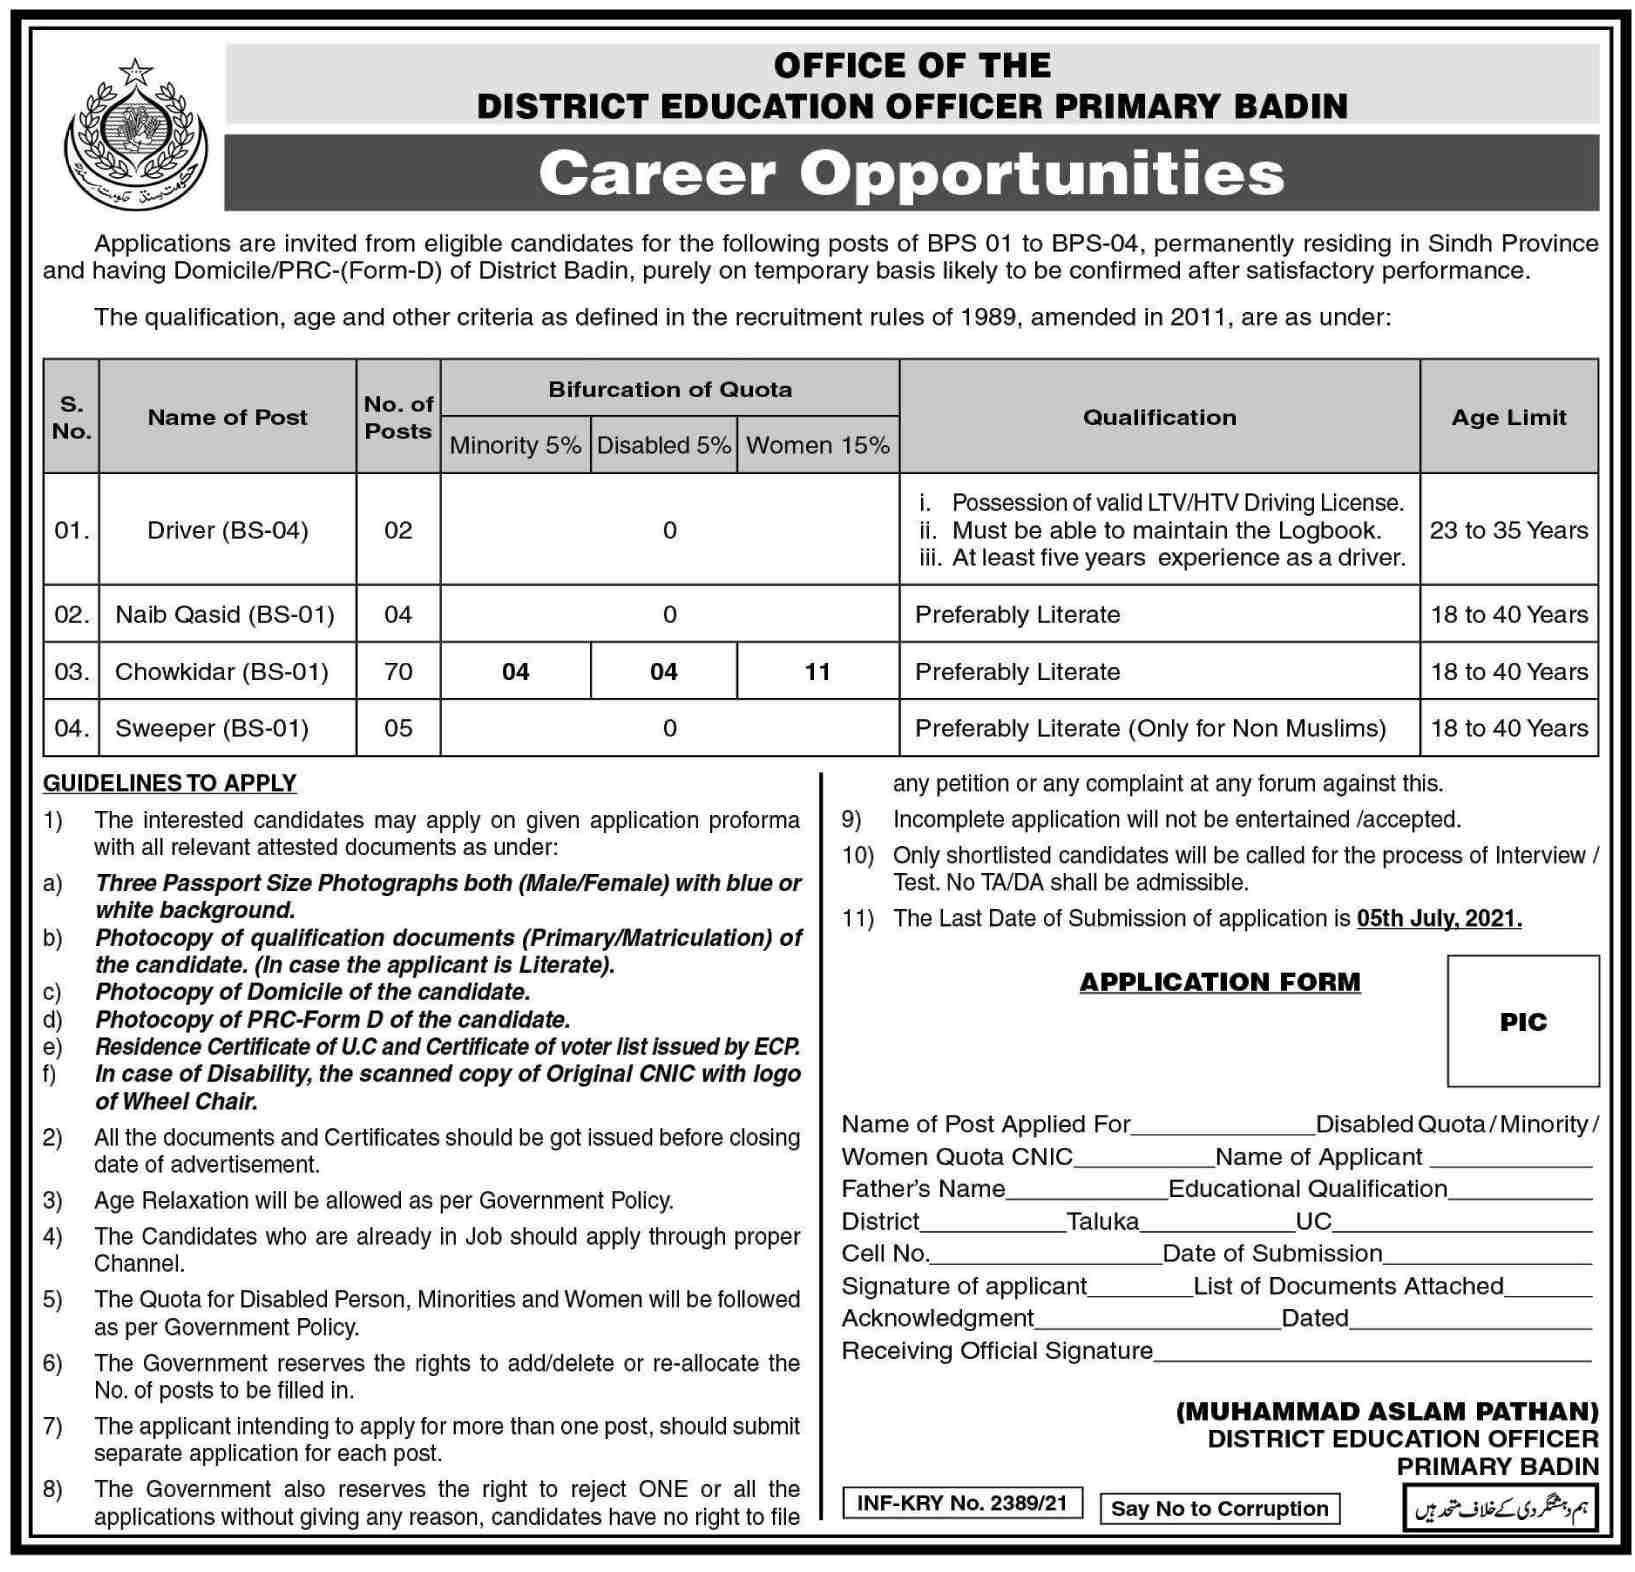 Sindh Education Department District Badin Jobs 2021 Latest Advertisement - Sindh Govt Jobs in Education Department 2021